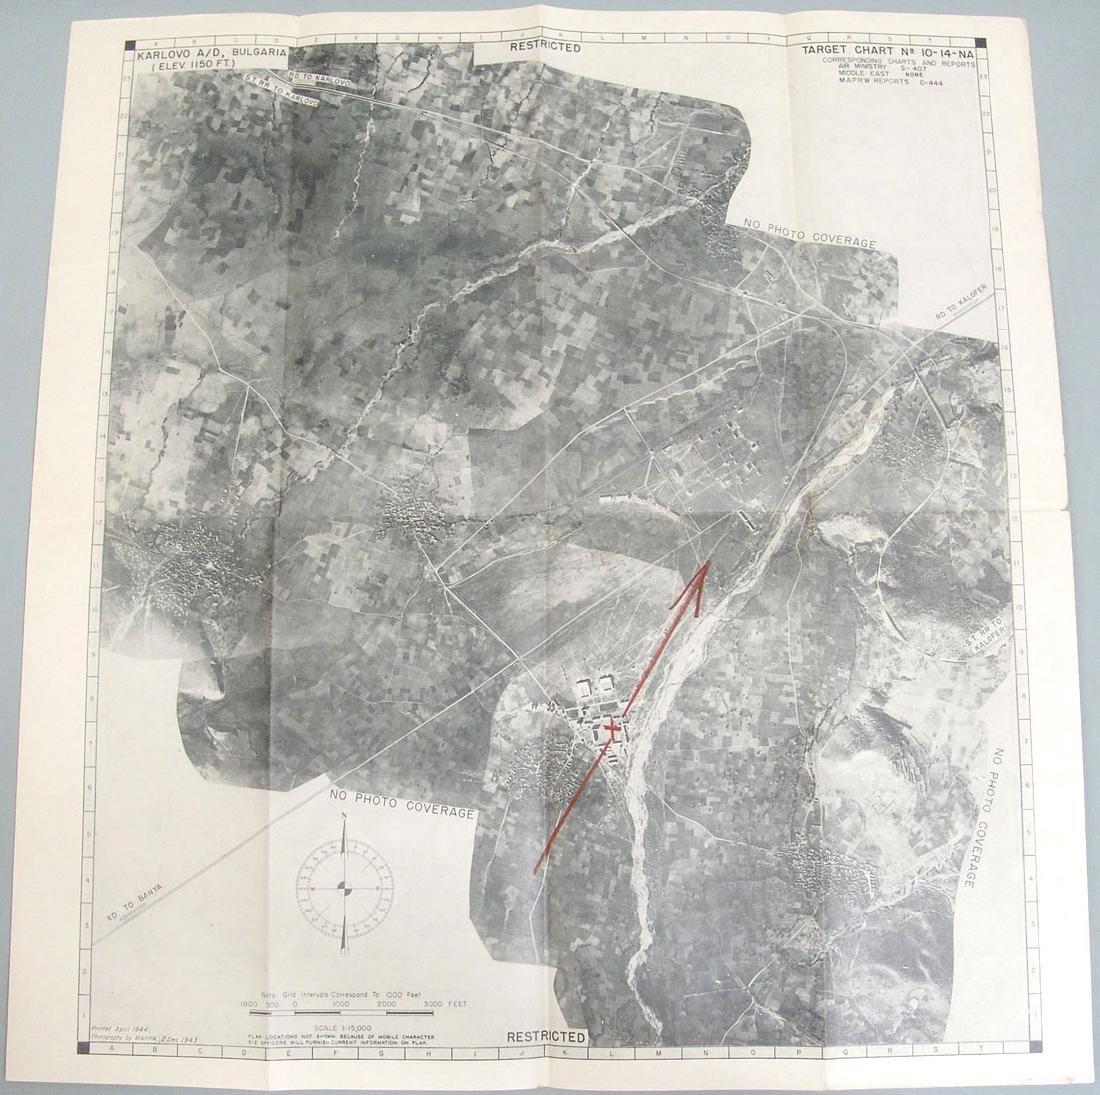 Original 1944 WWII Allied Bombing Map - Bulgaria - 2